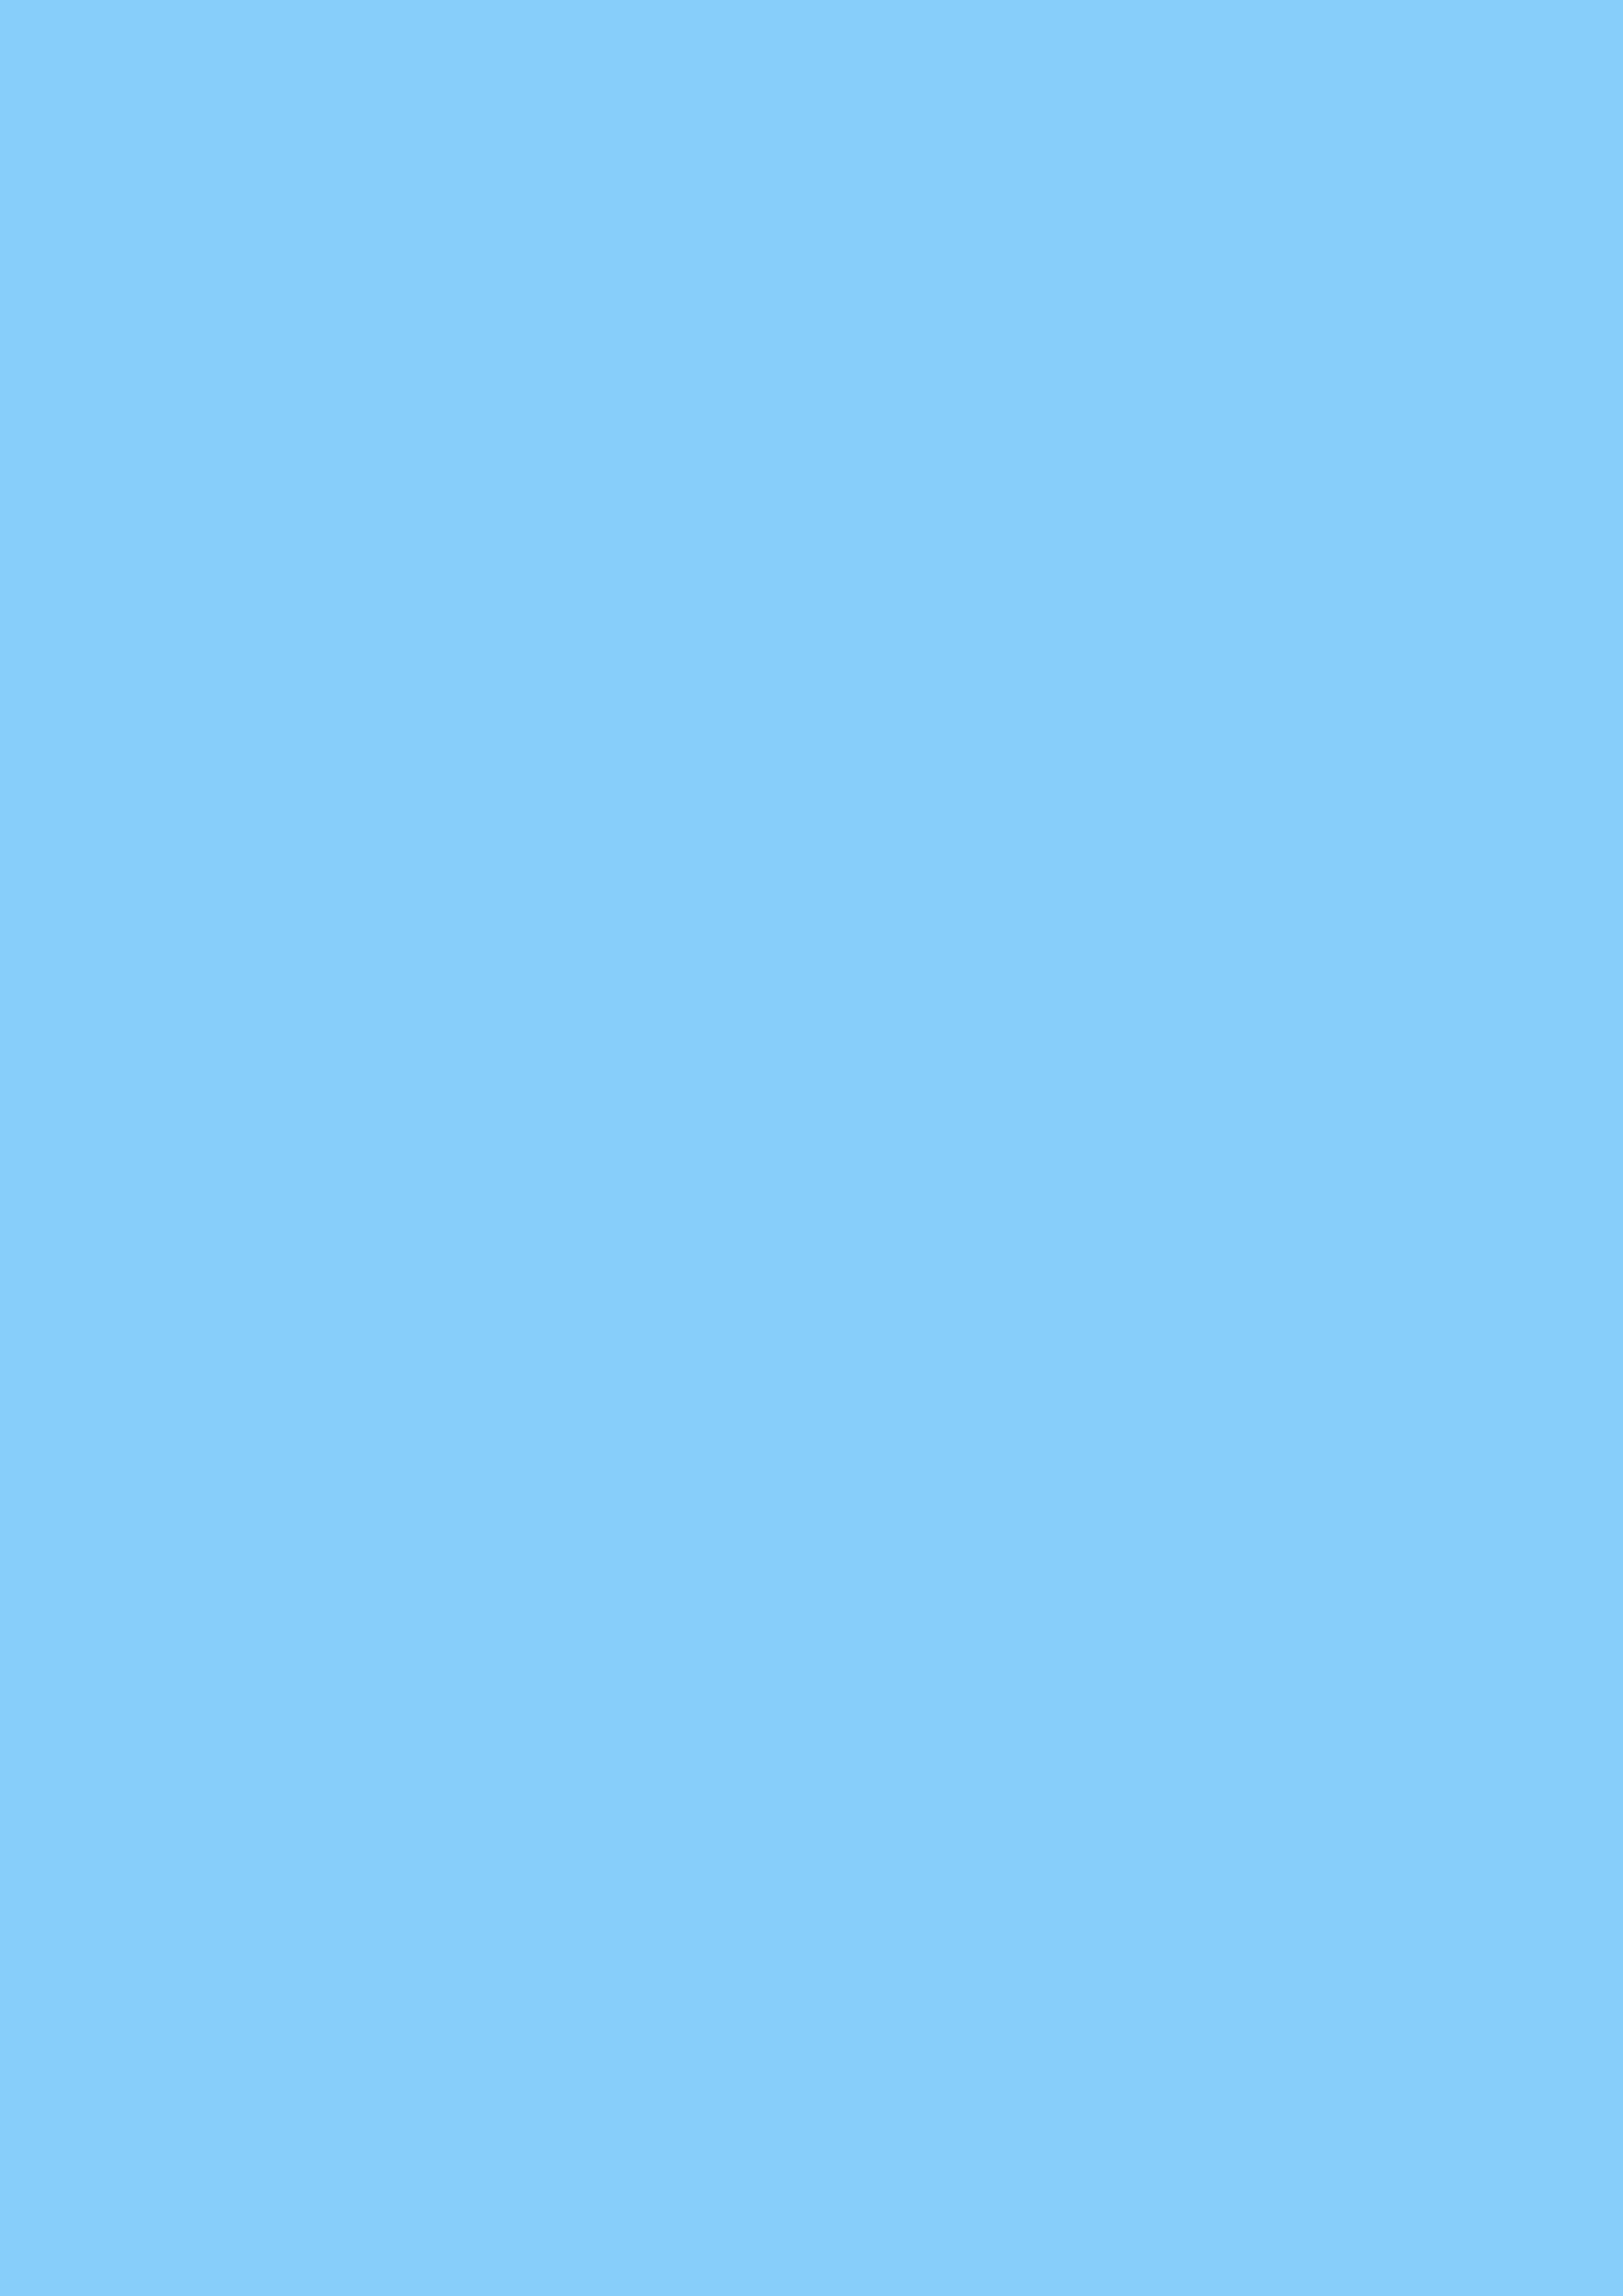 2480x3508 Light Sky Blue Solid Color Background